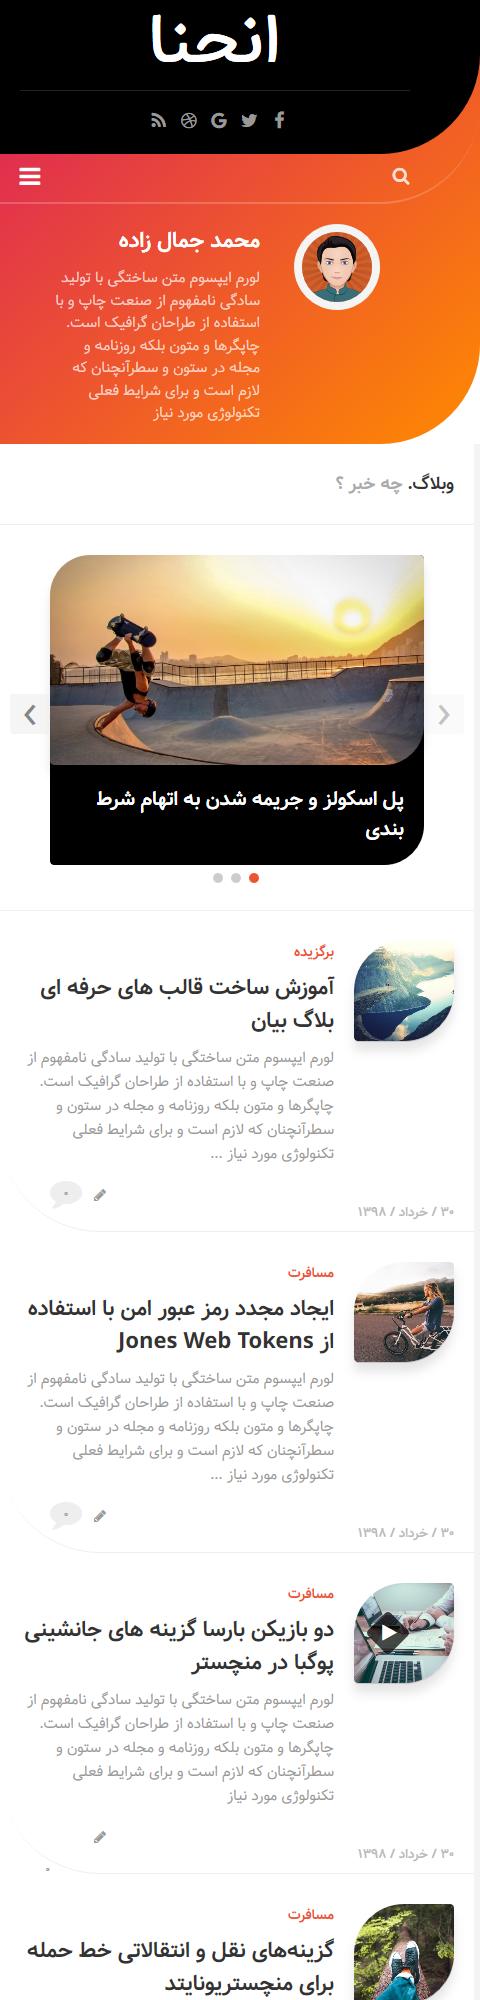 Screen Shot 2019 06 21 at 00.00.29 قالب انحنا بلاگ بیان